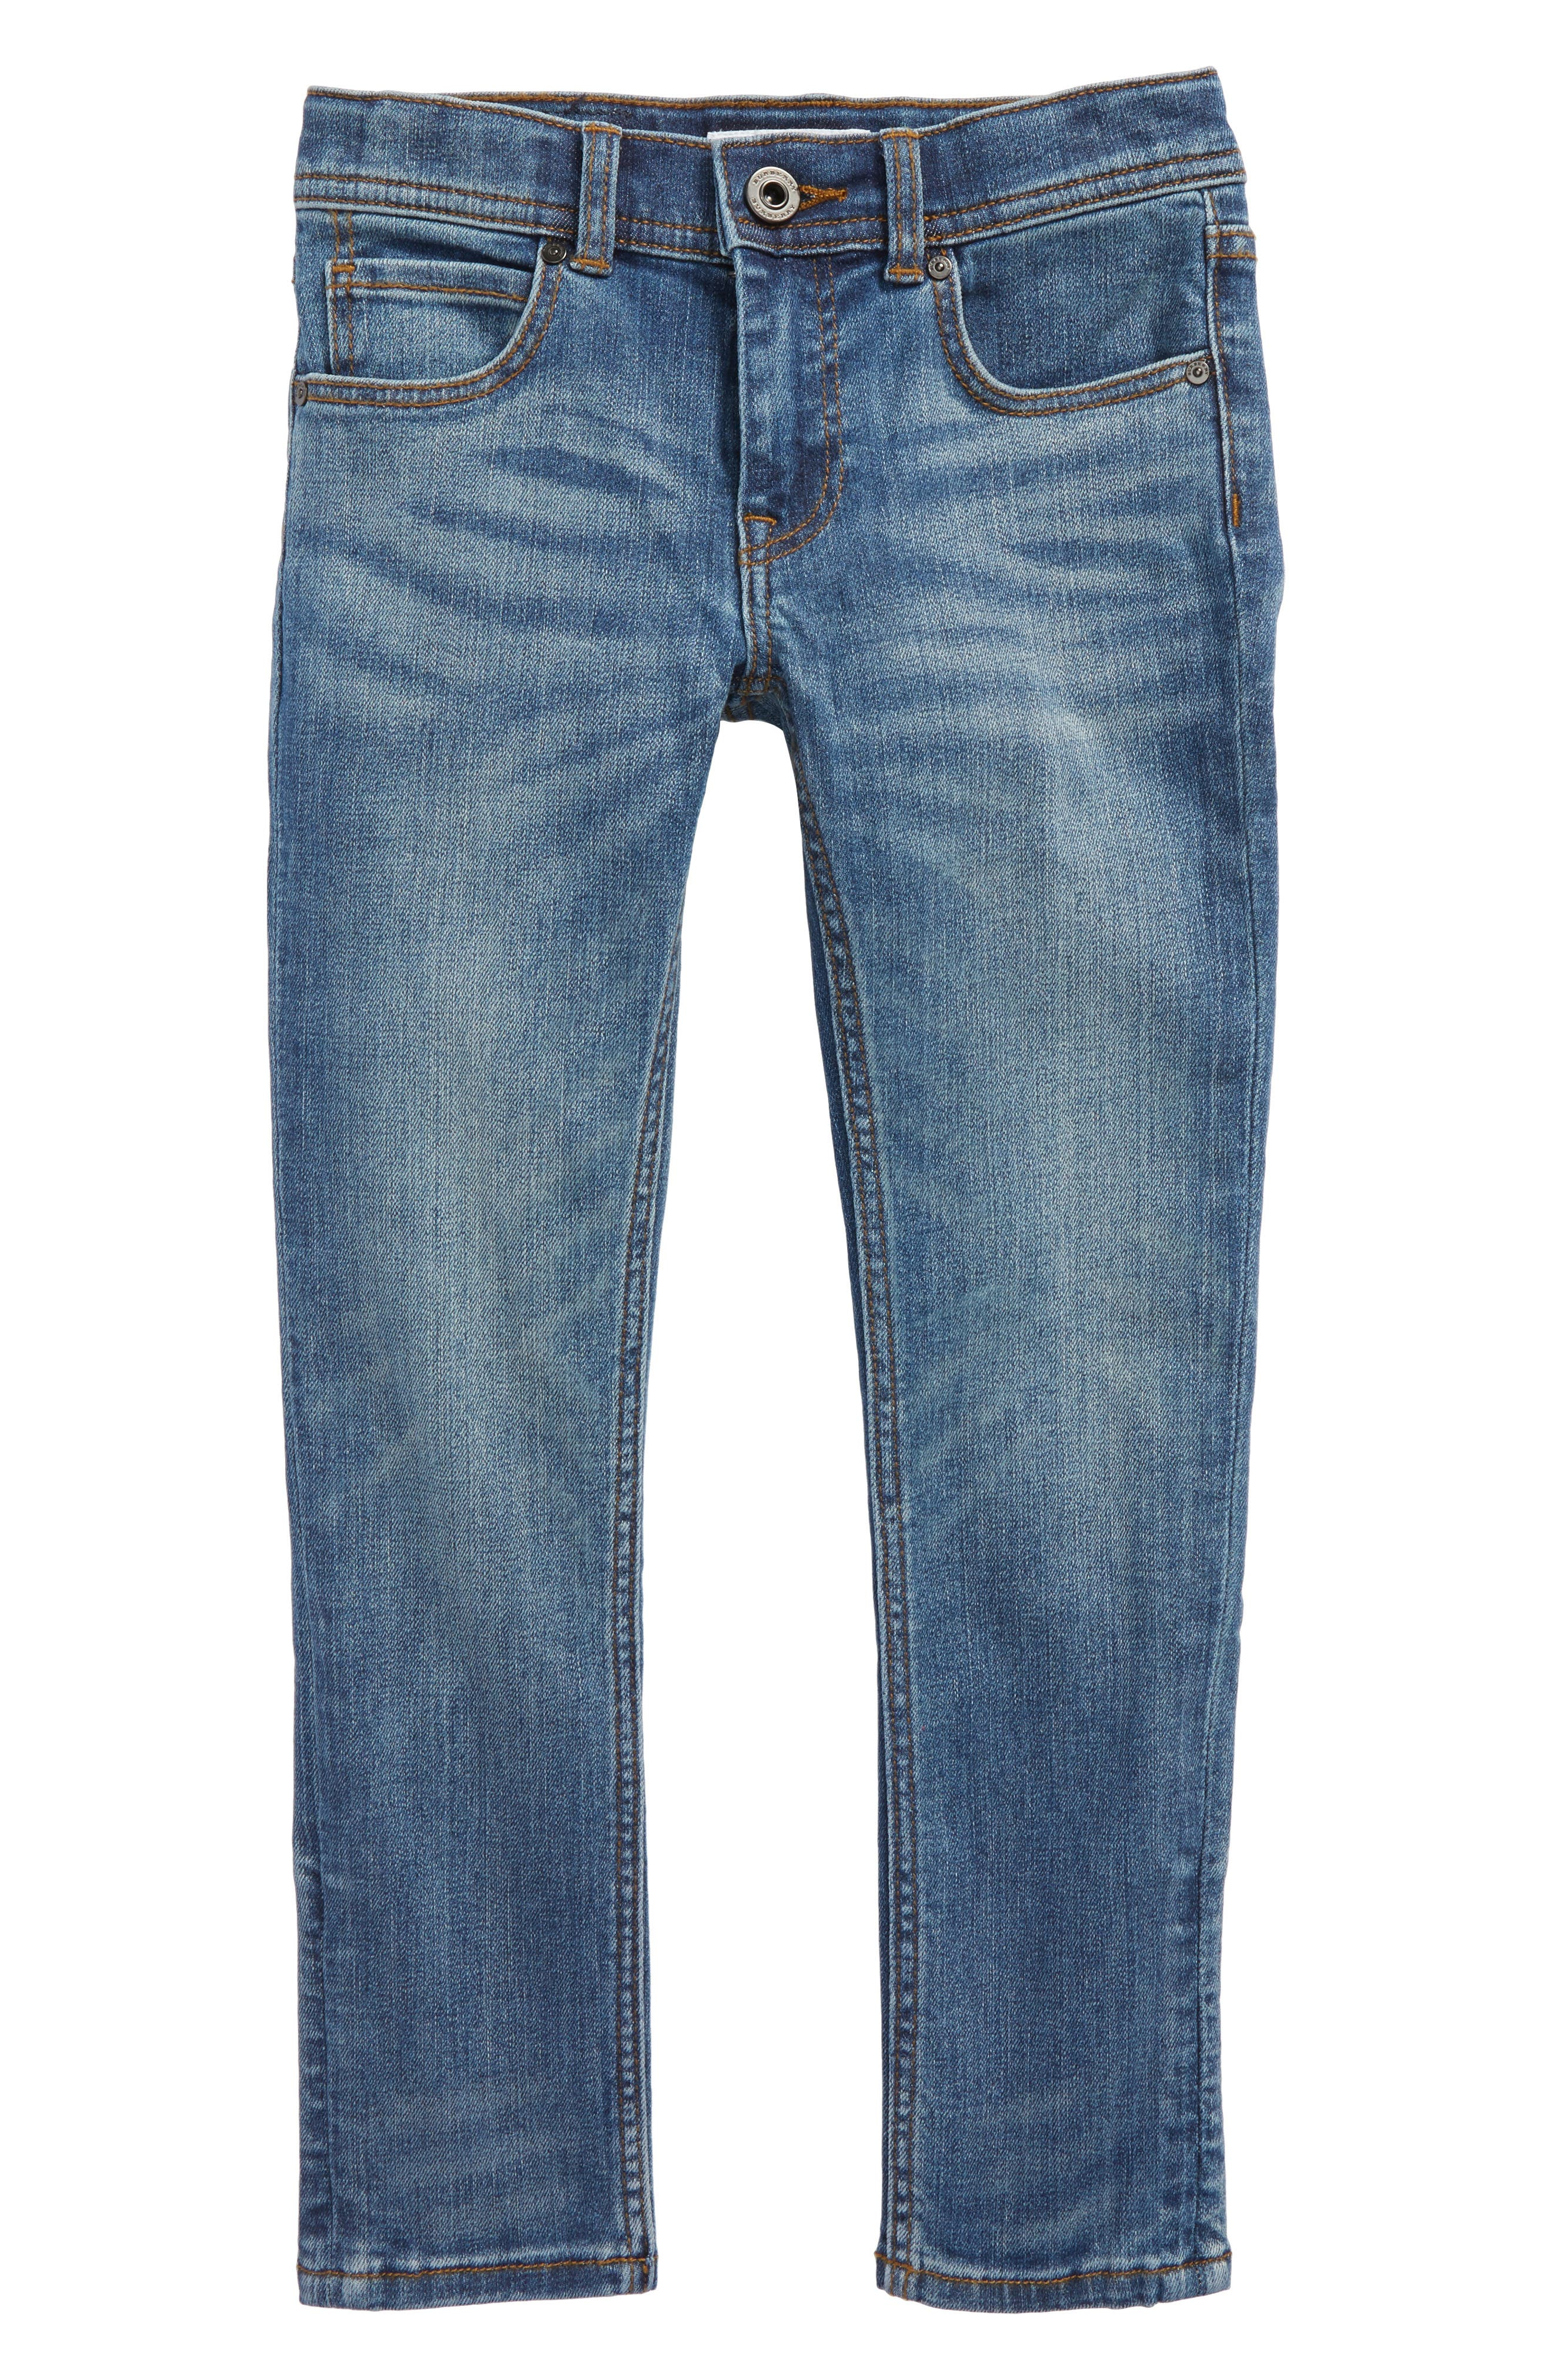 Skinny Jeans,                         Main,                         color, Mid Indigo